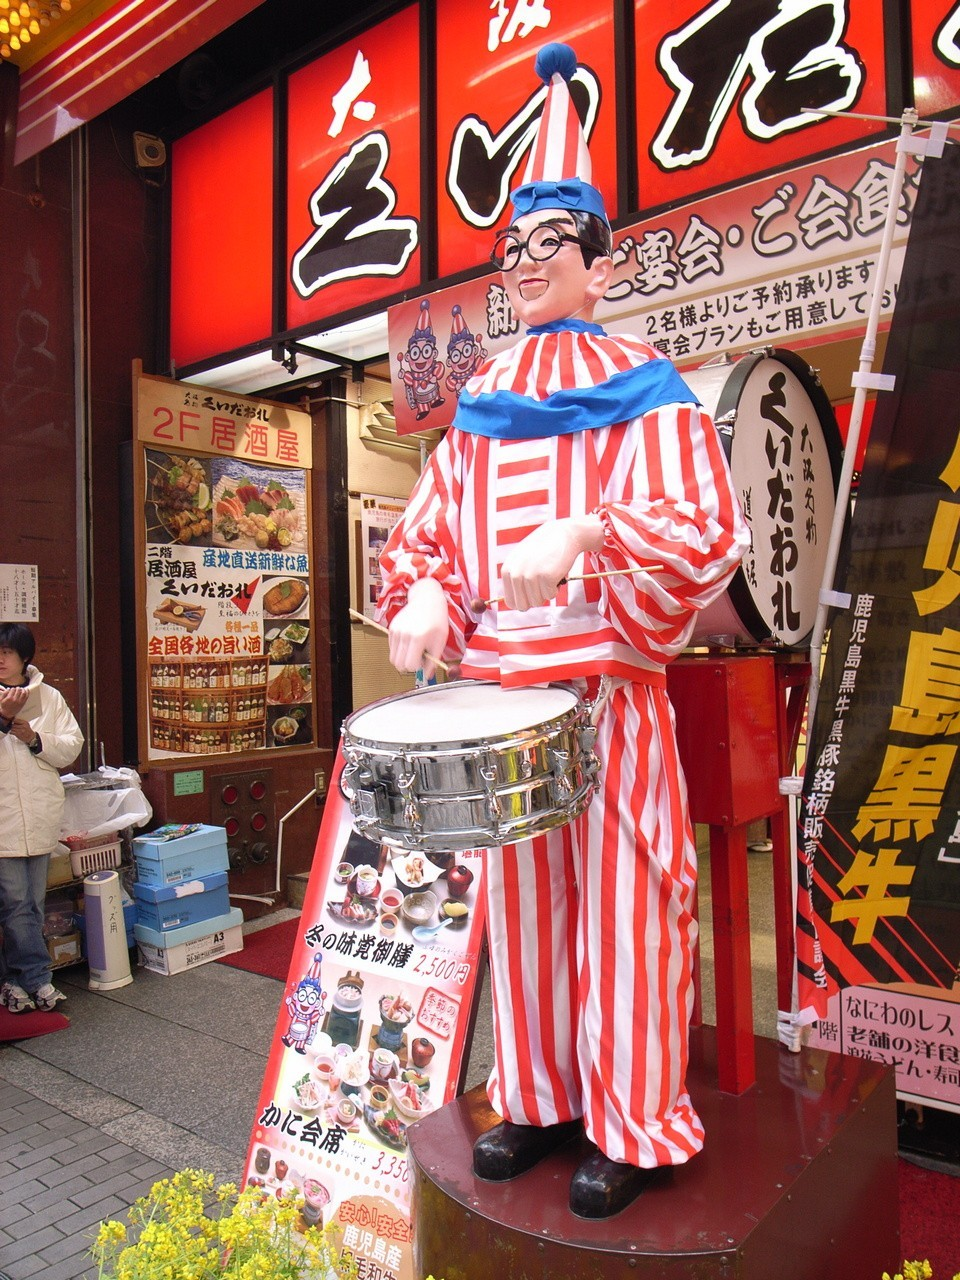 Kuidaore_doll_by_matsuyuki_in_Dotonbori,_Osaka